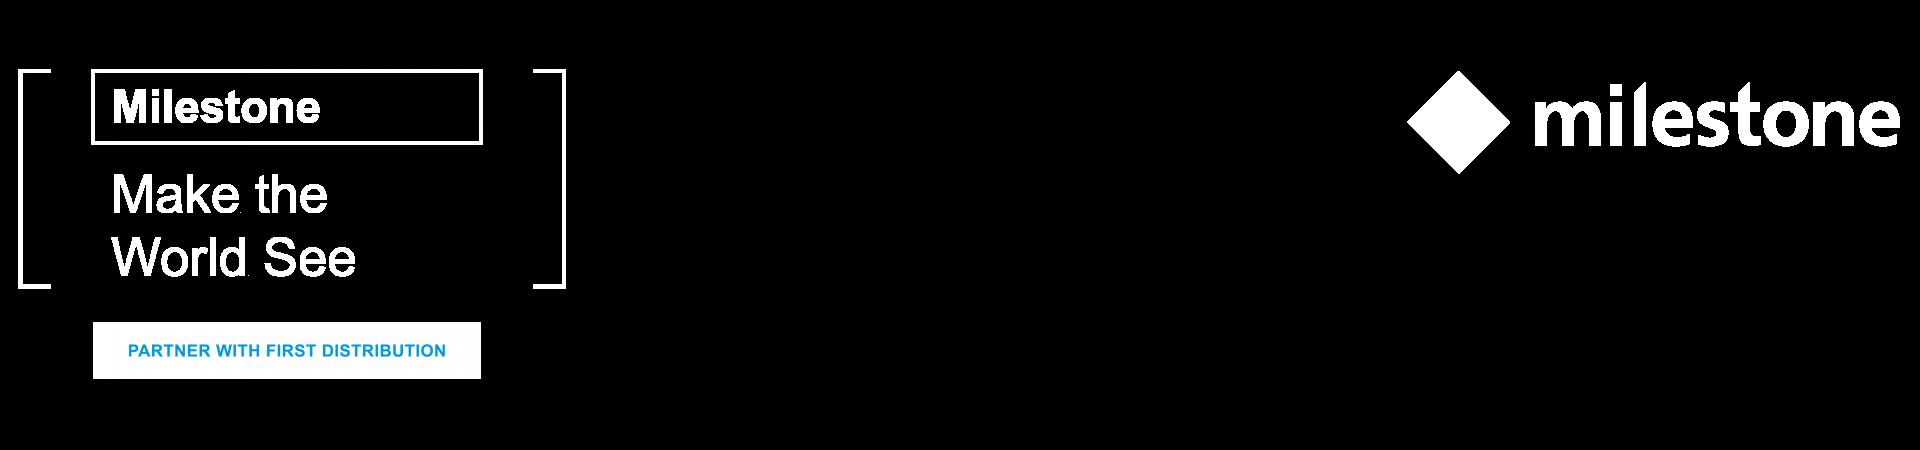 Milestone Microsite Header Overlay-01